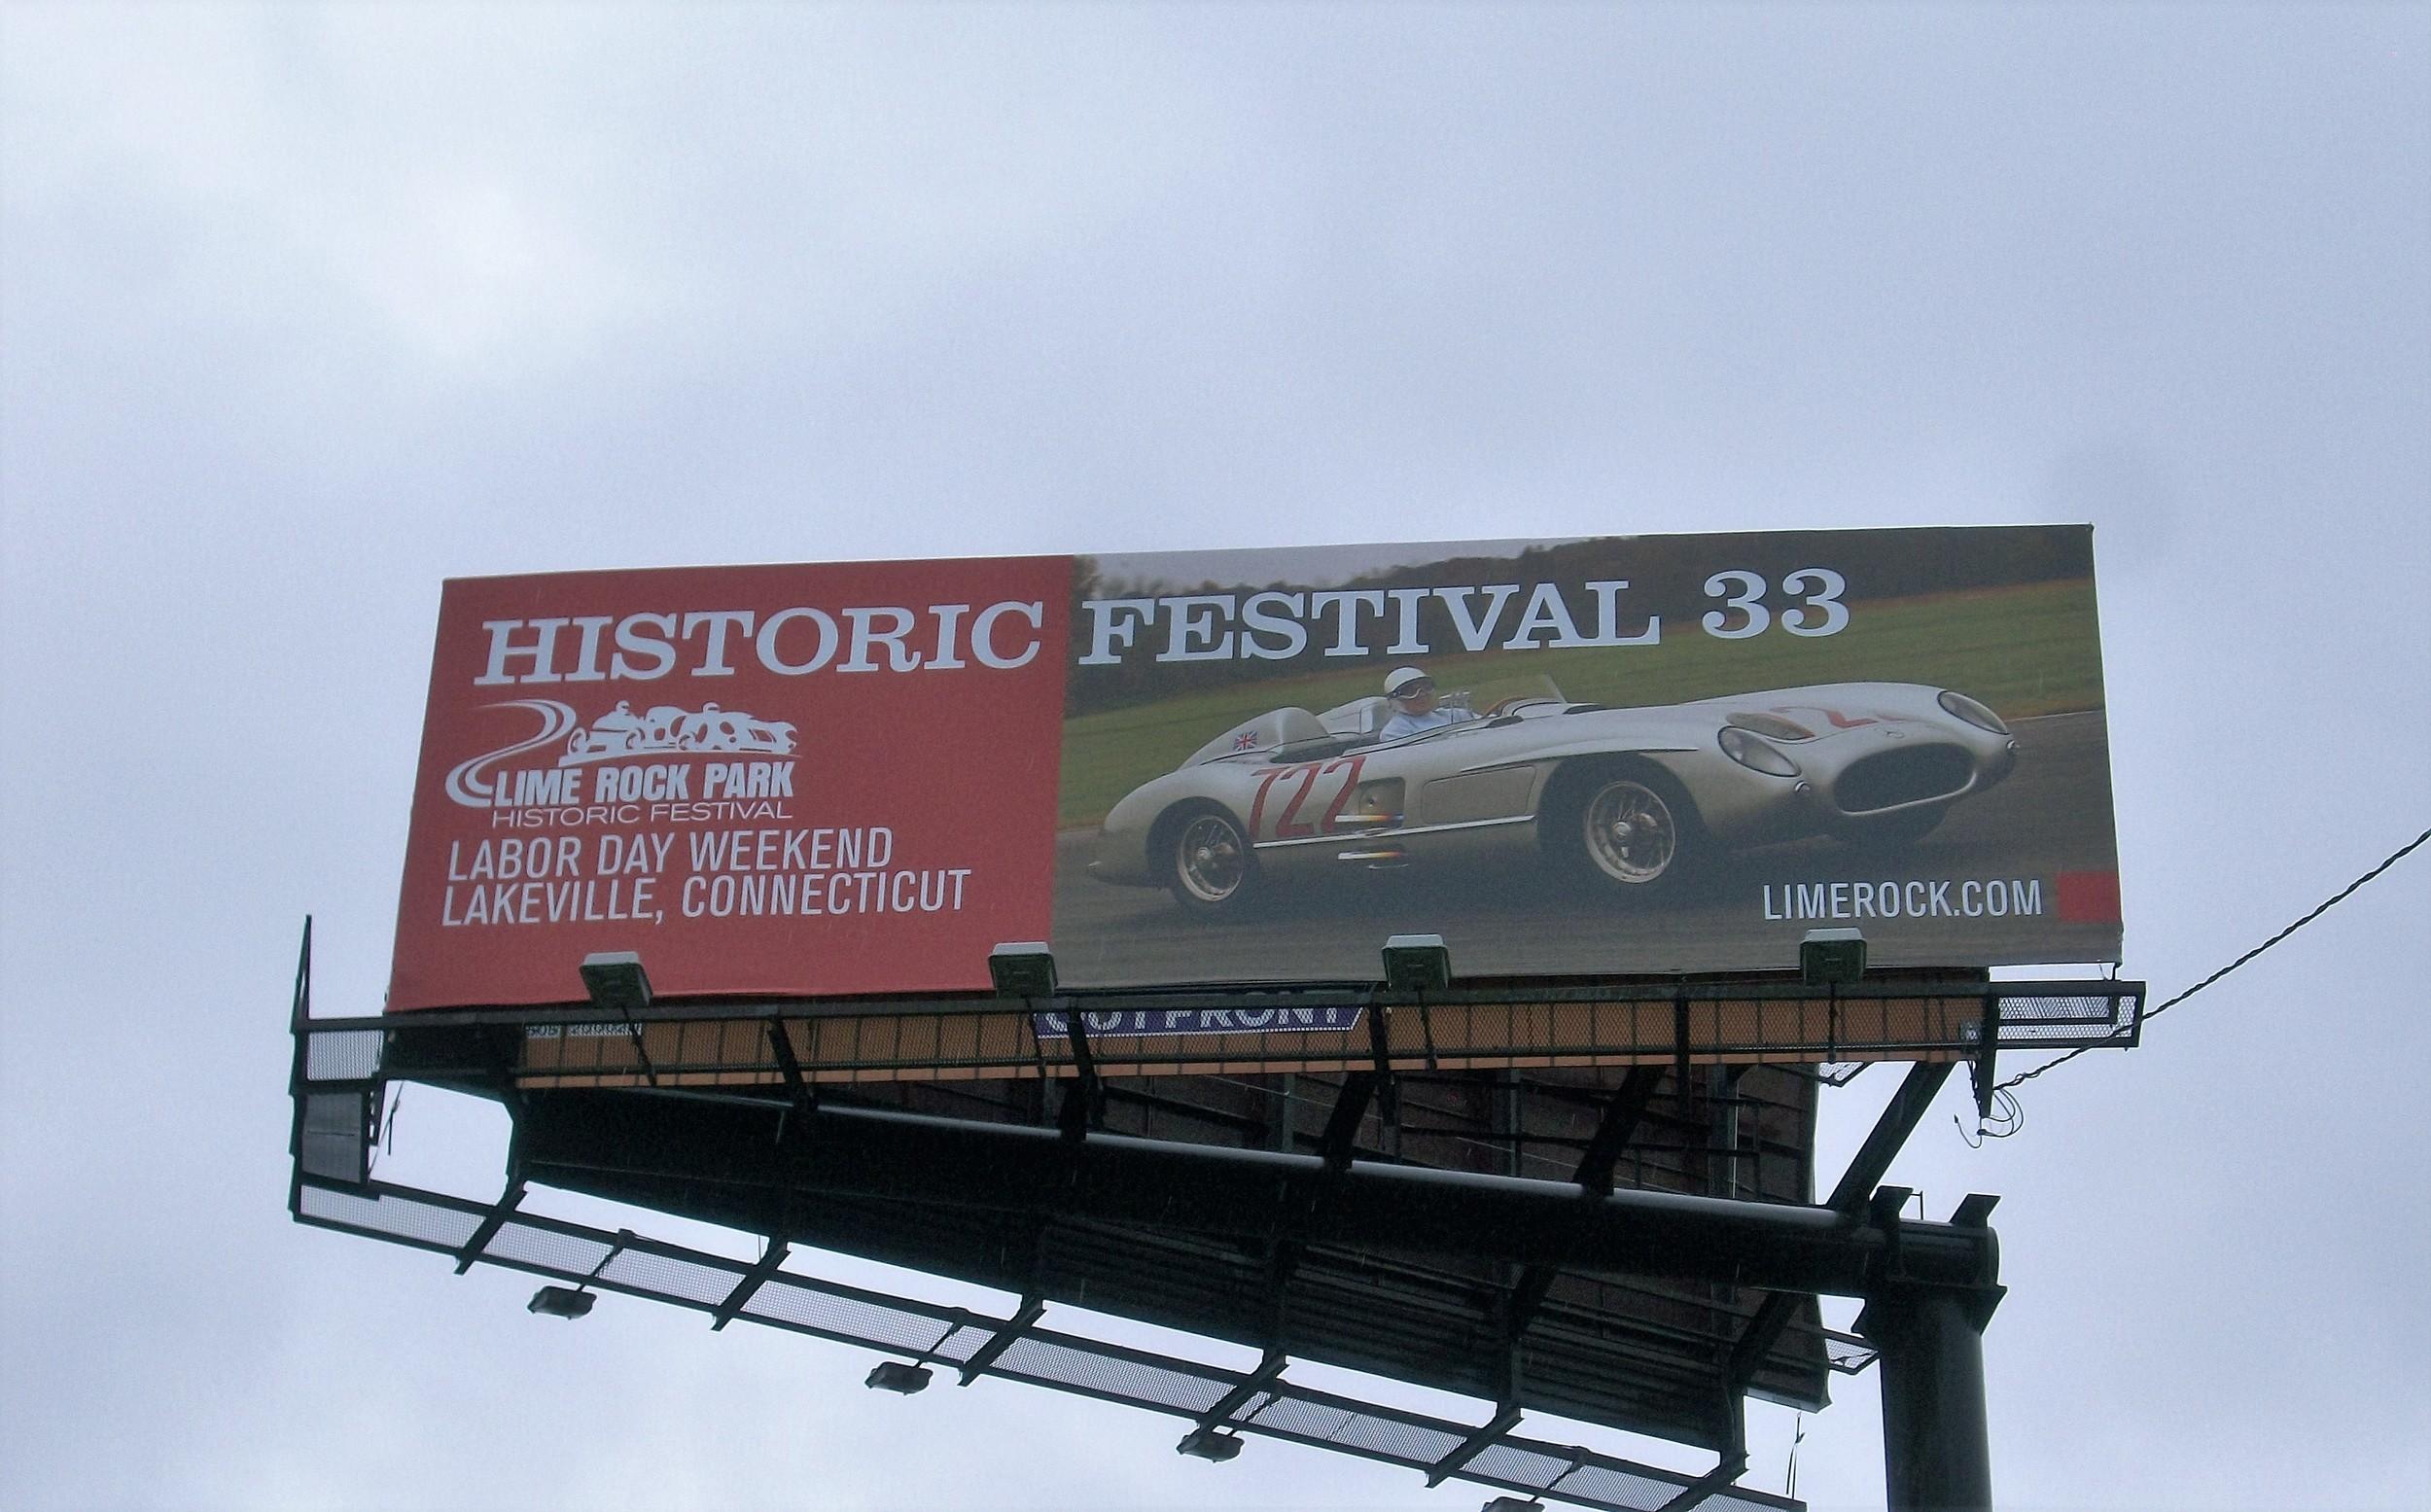 Lime Rock Park_Historics33_1902859_8.10.15 (2).JPG